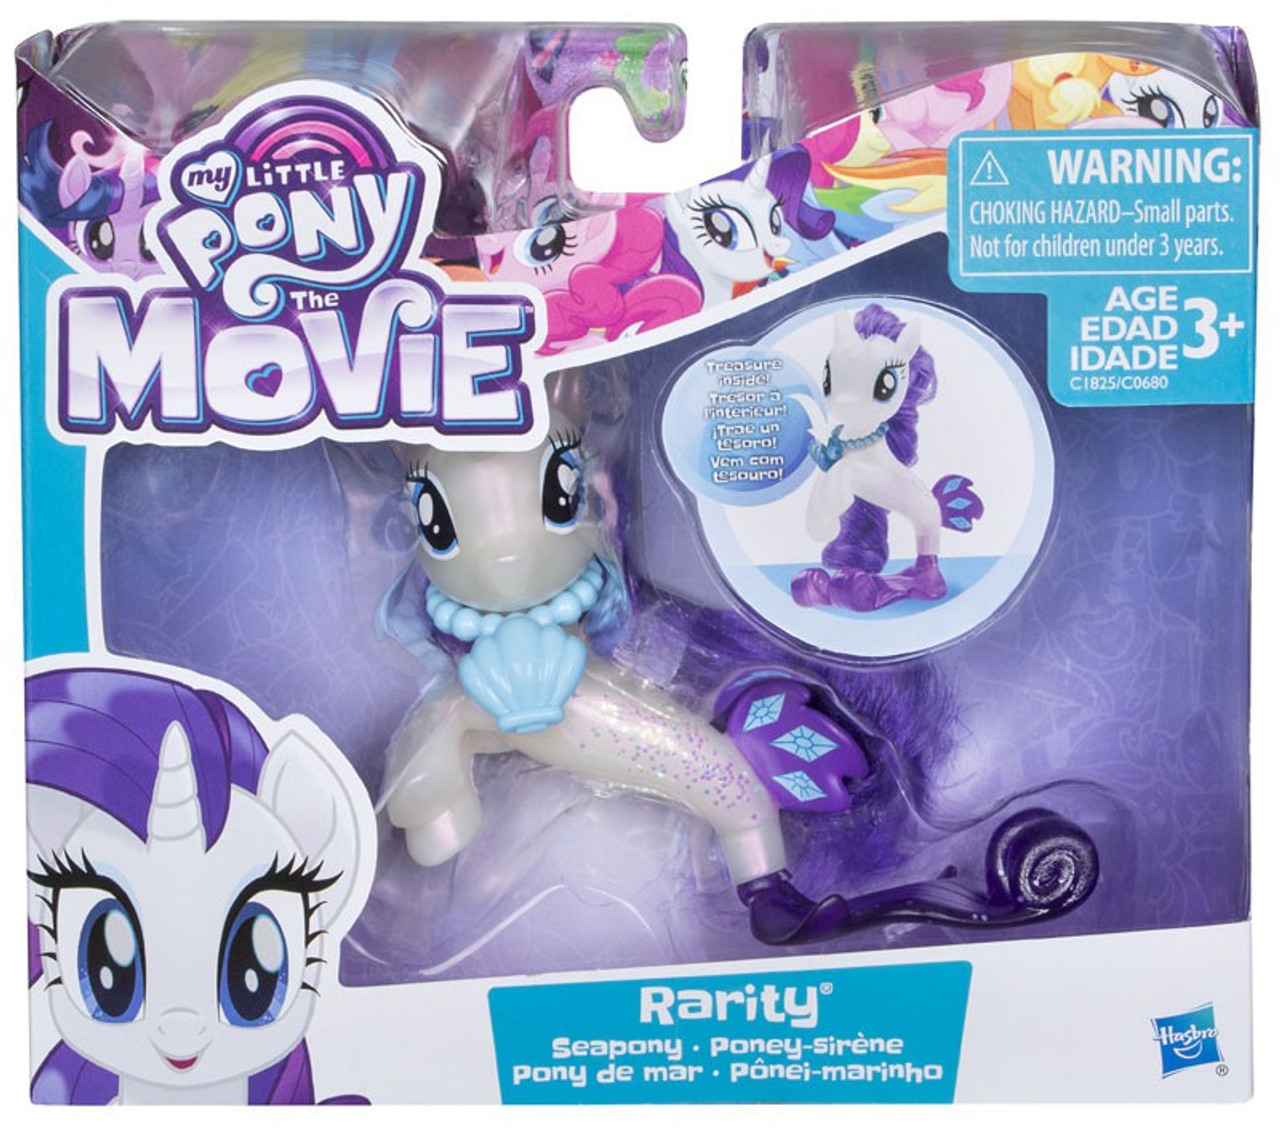 My Little Pony The Movie Rarity Seapony Figure